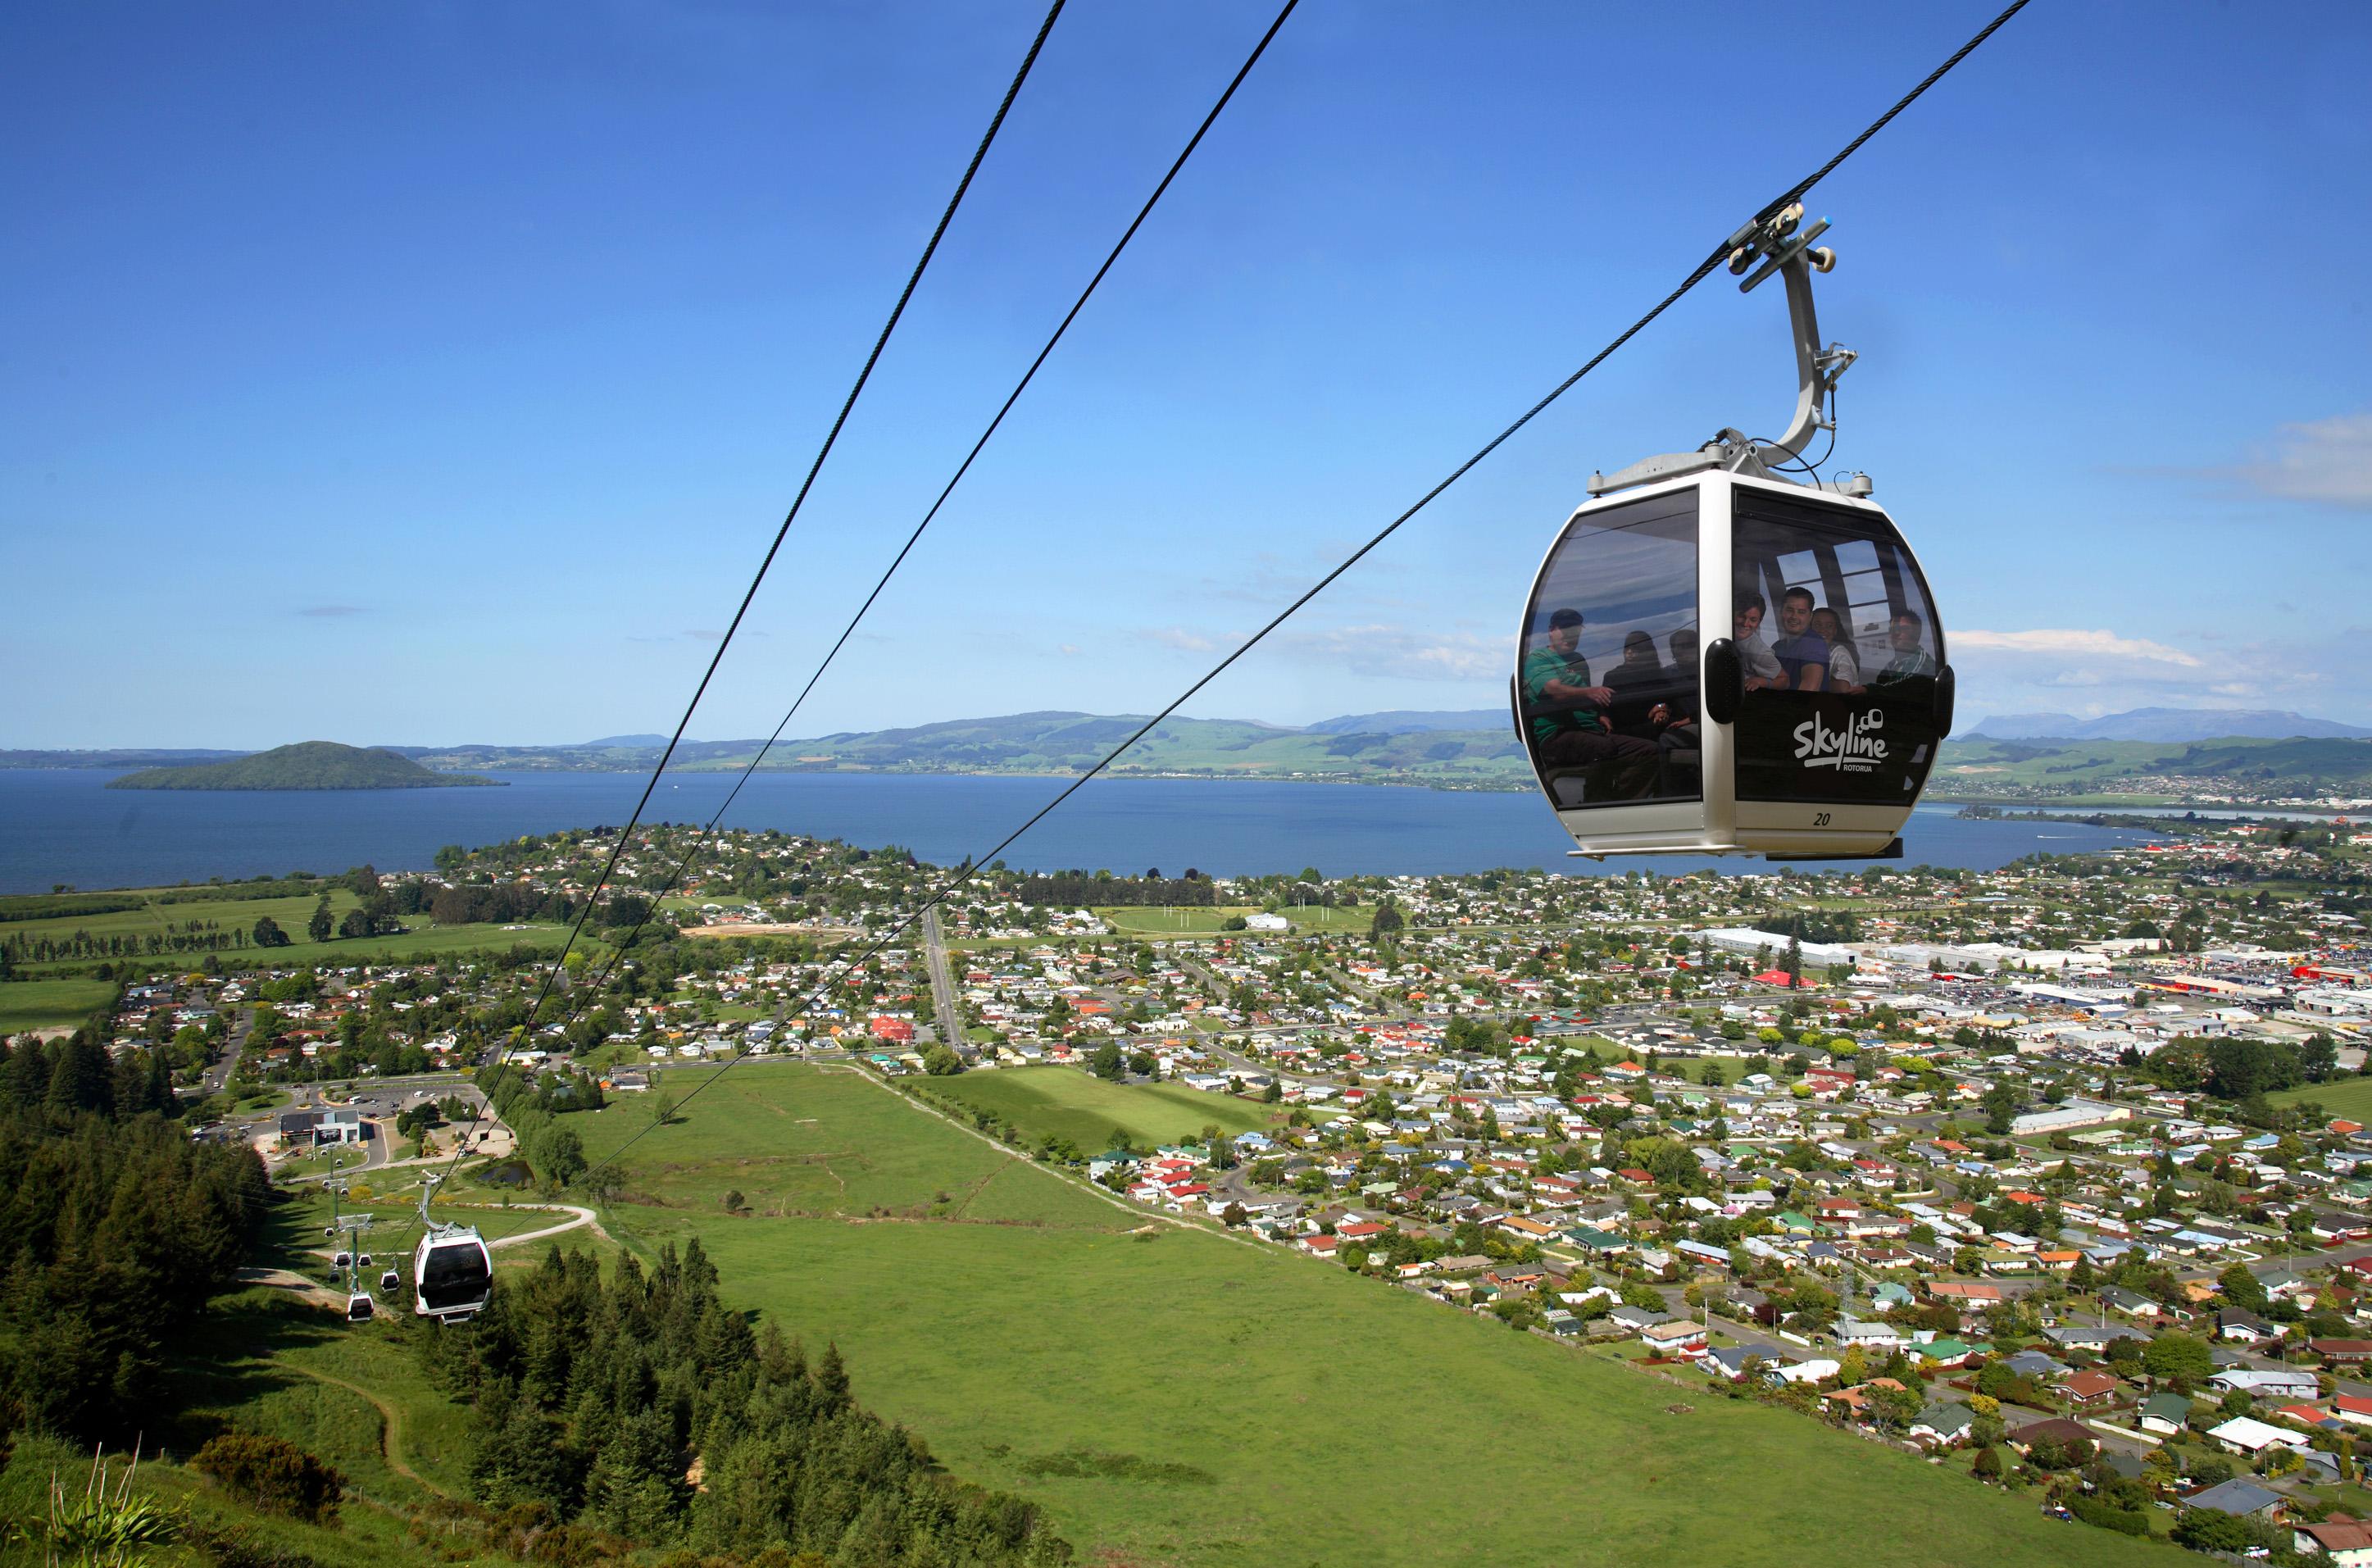 Skyline Rotorua Gondela